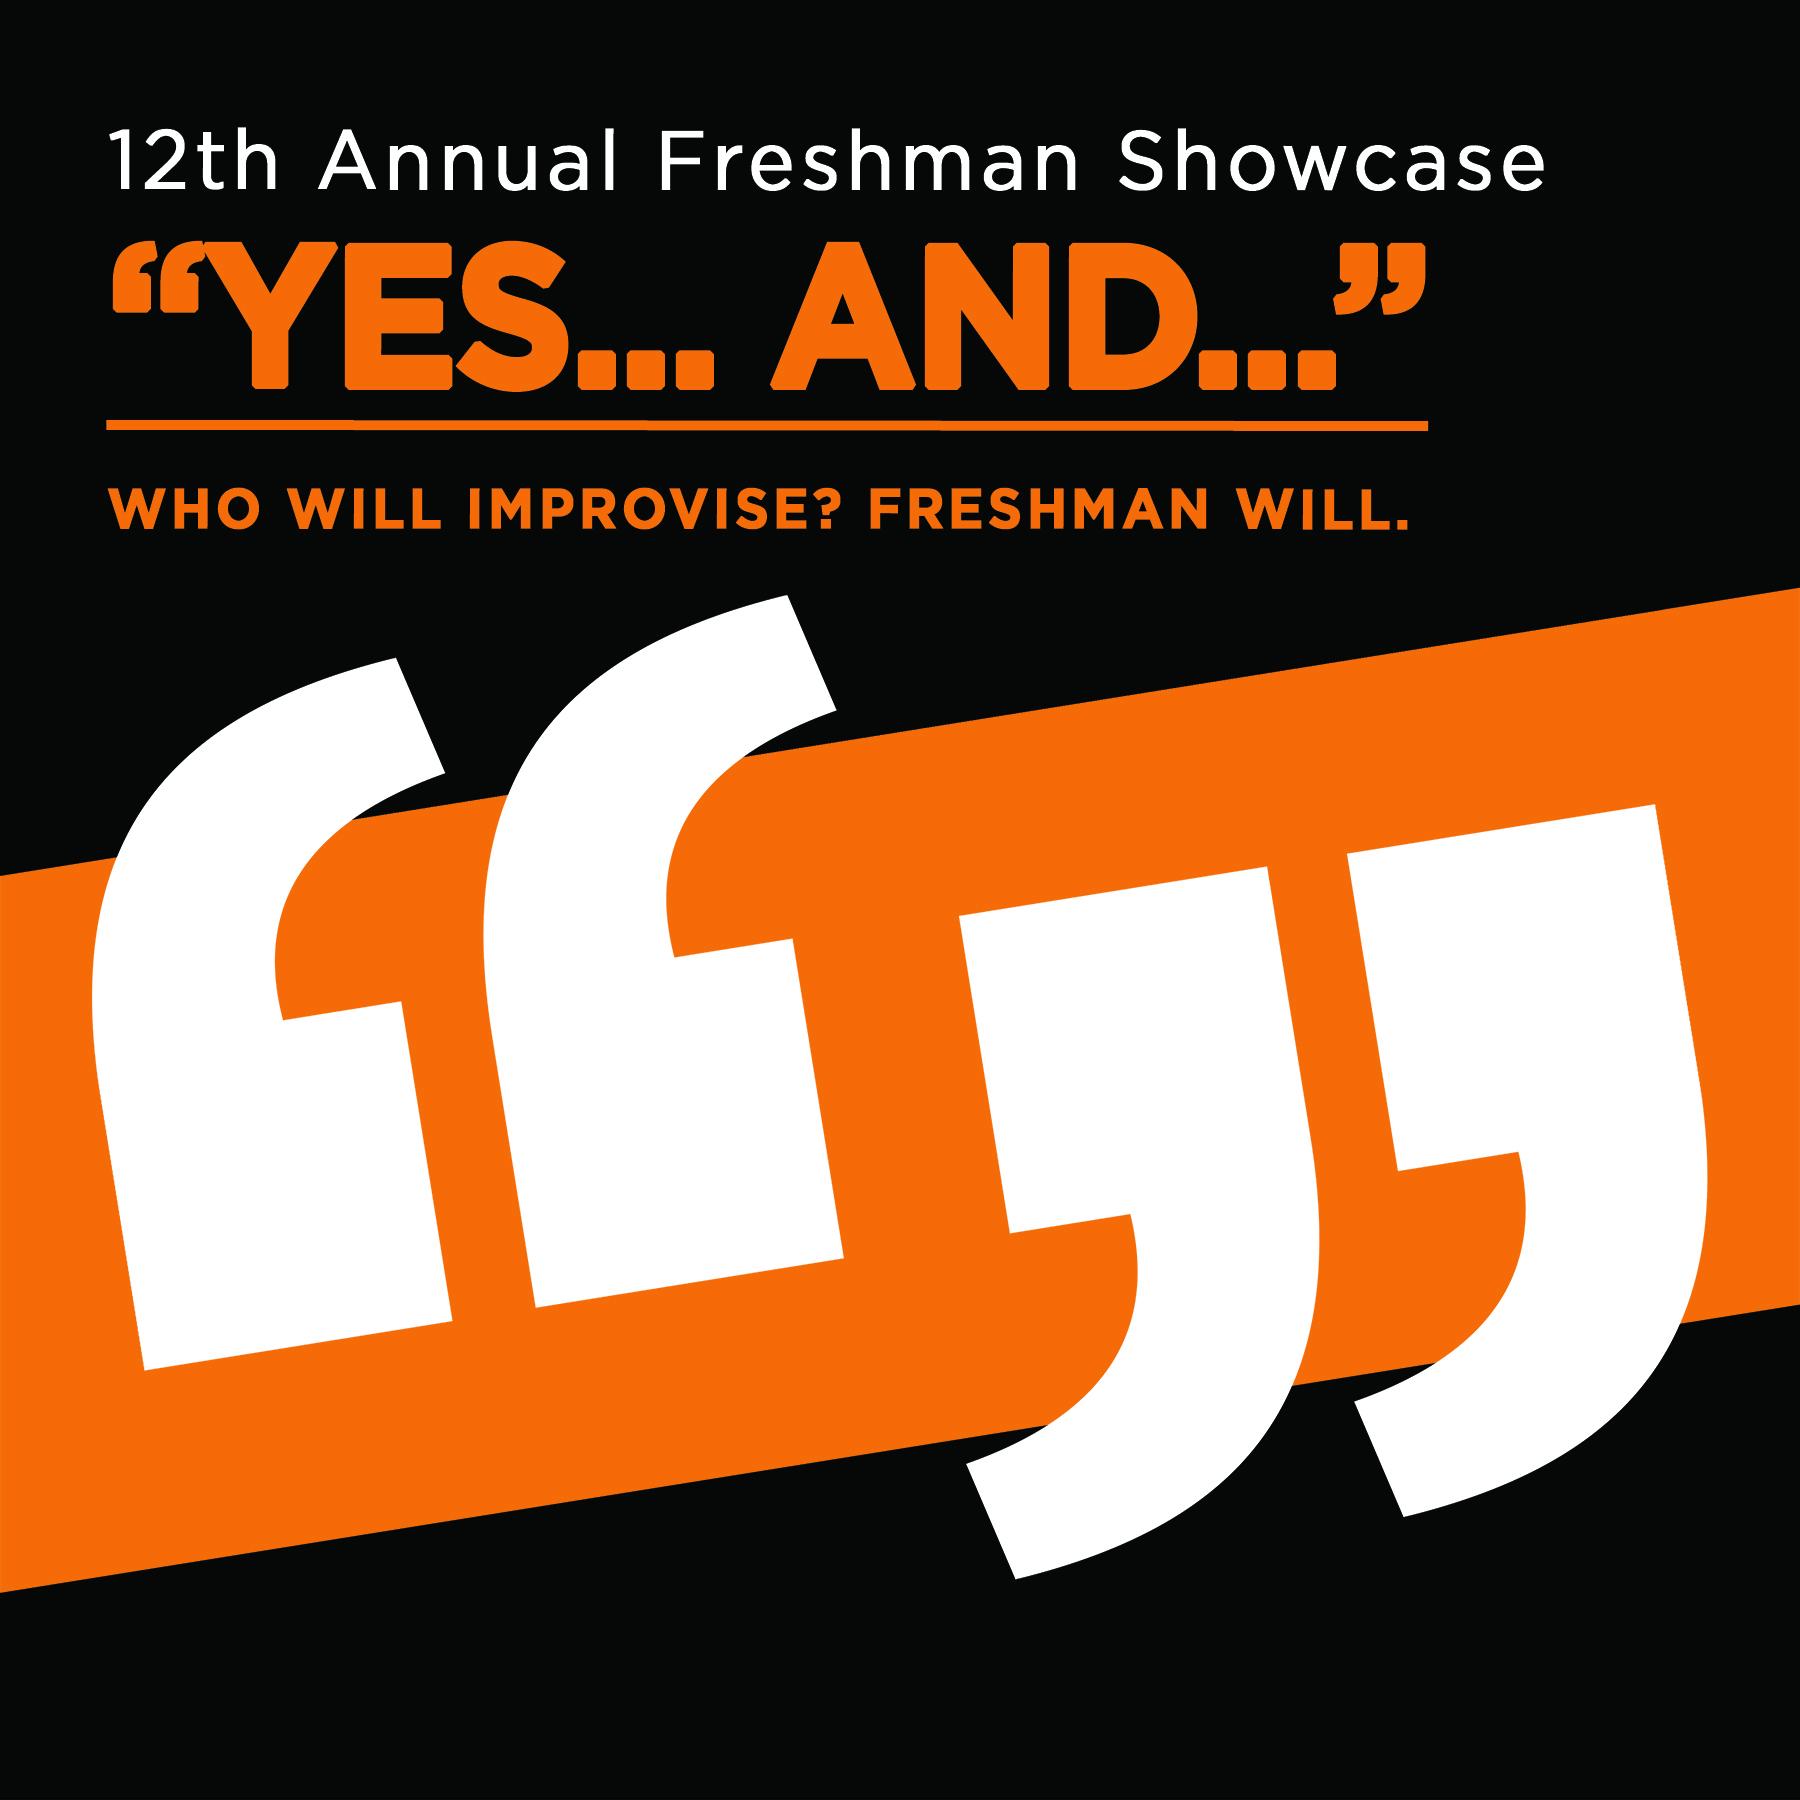 Freshman Showcase: Yes...And... @ MSU Auditorium Studio 60 Theatre